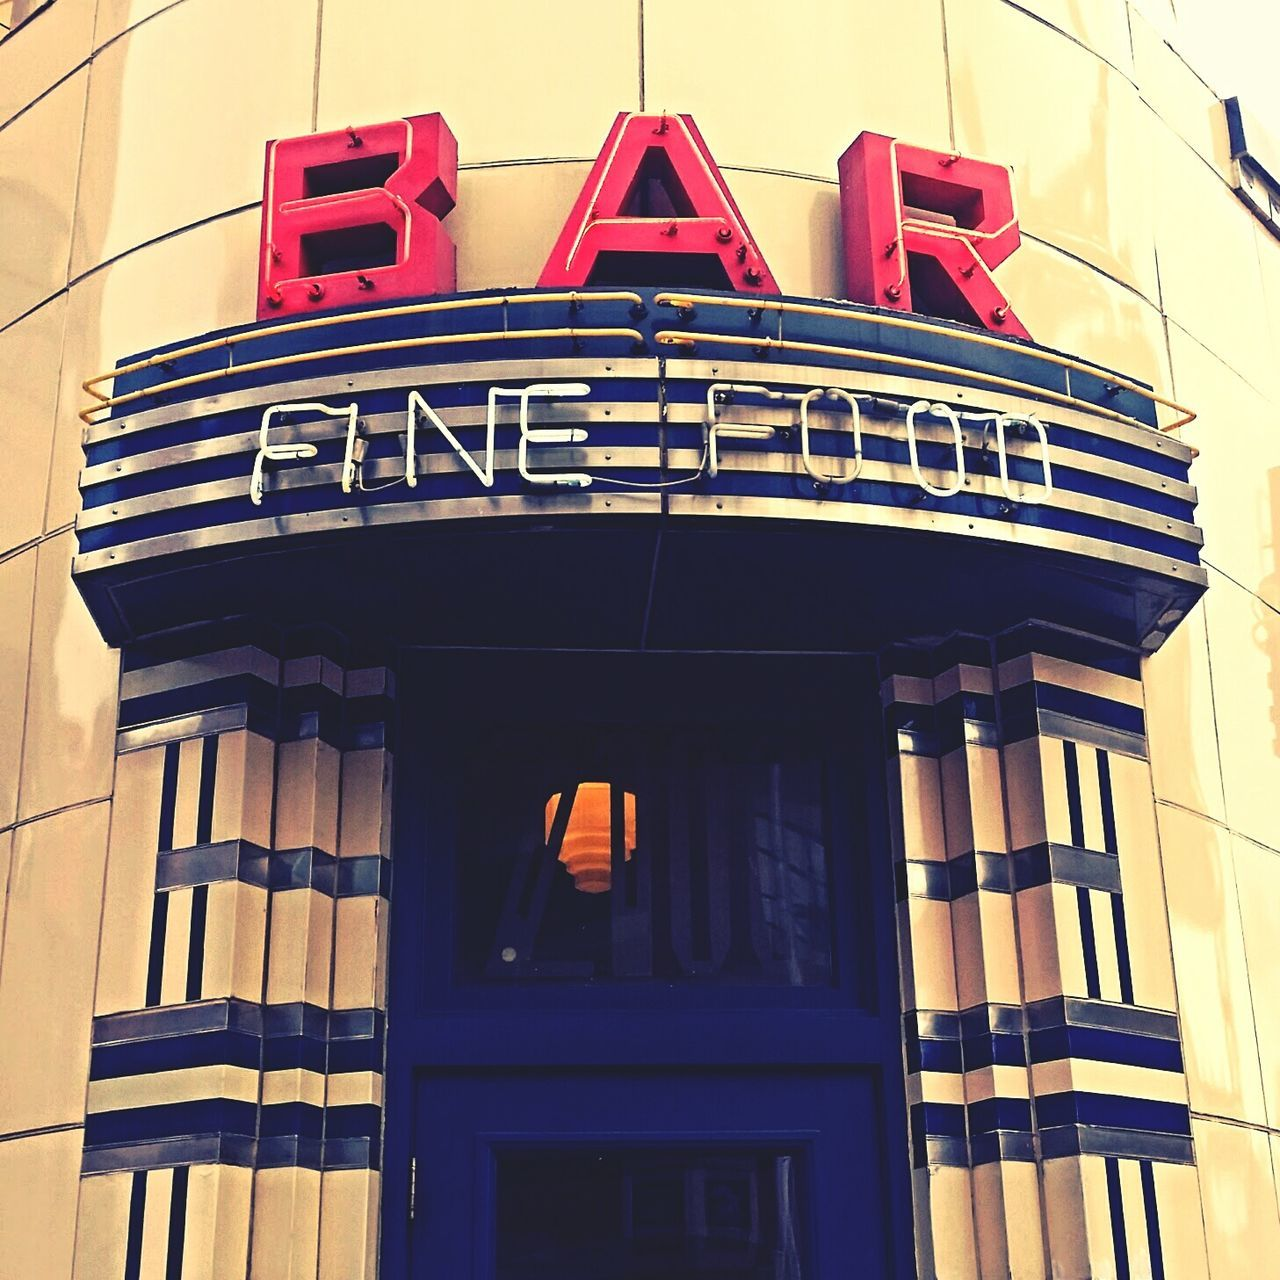 The Elwood Bar Elwood Detroit Michigan Downtown Detroit Historic Bar Comericapark Ford Field The Spirit Of Detroit Bar Lounge Lounge Bar Art Deco Architecture Art Deco Art Deco Building Art Deco Diner Diner DetroitVsEverybody Detroit, MI